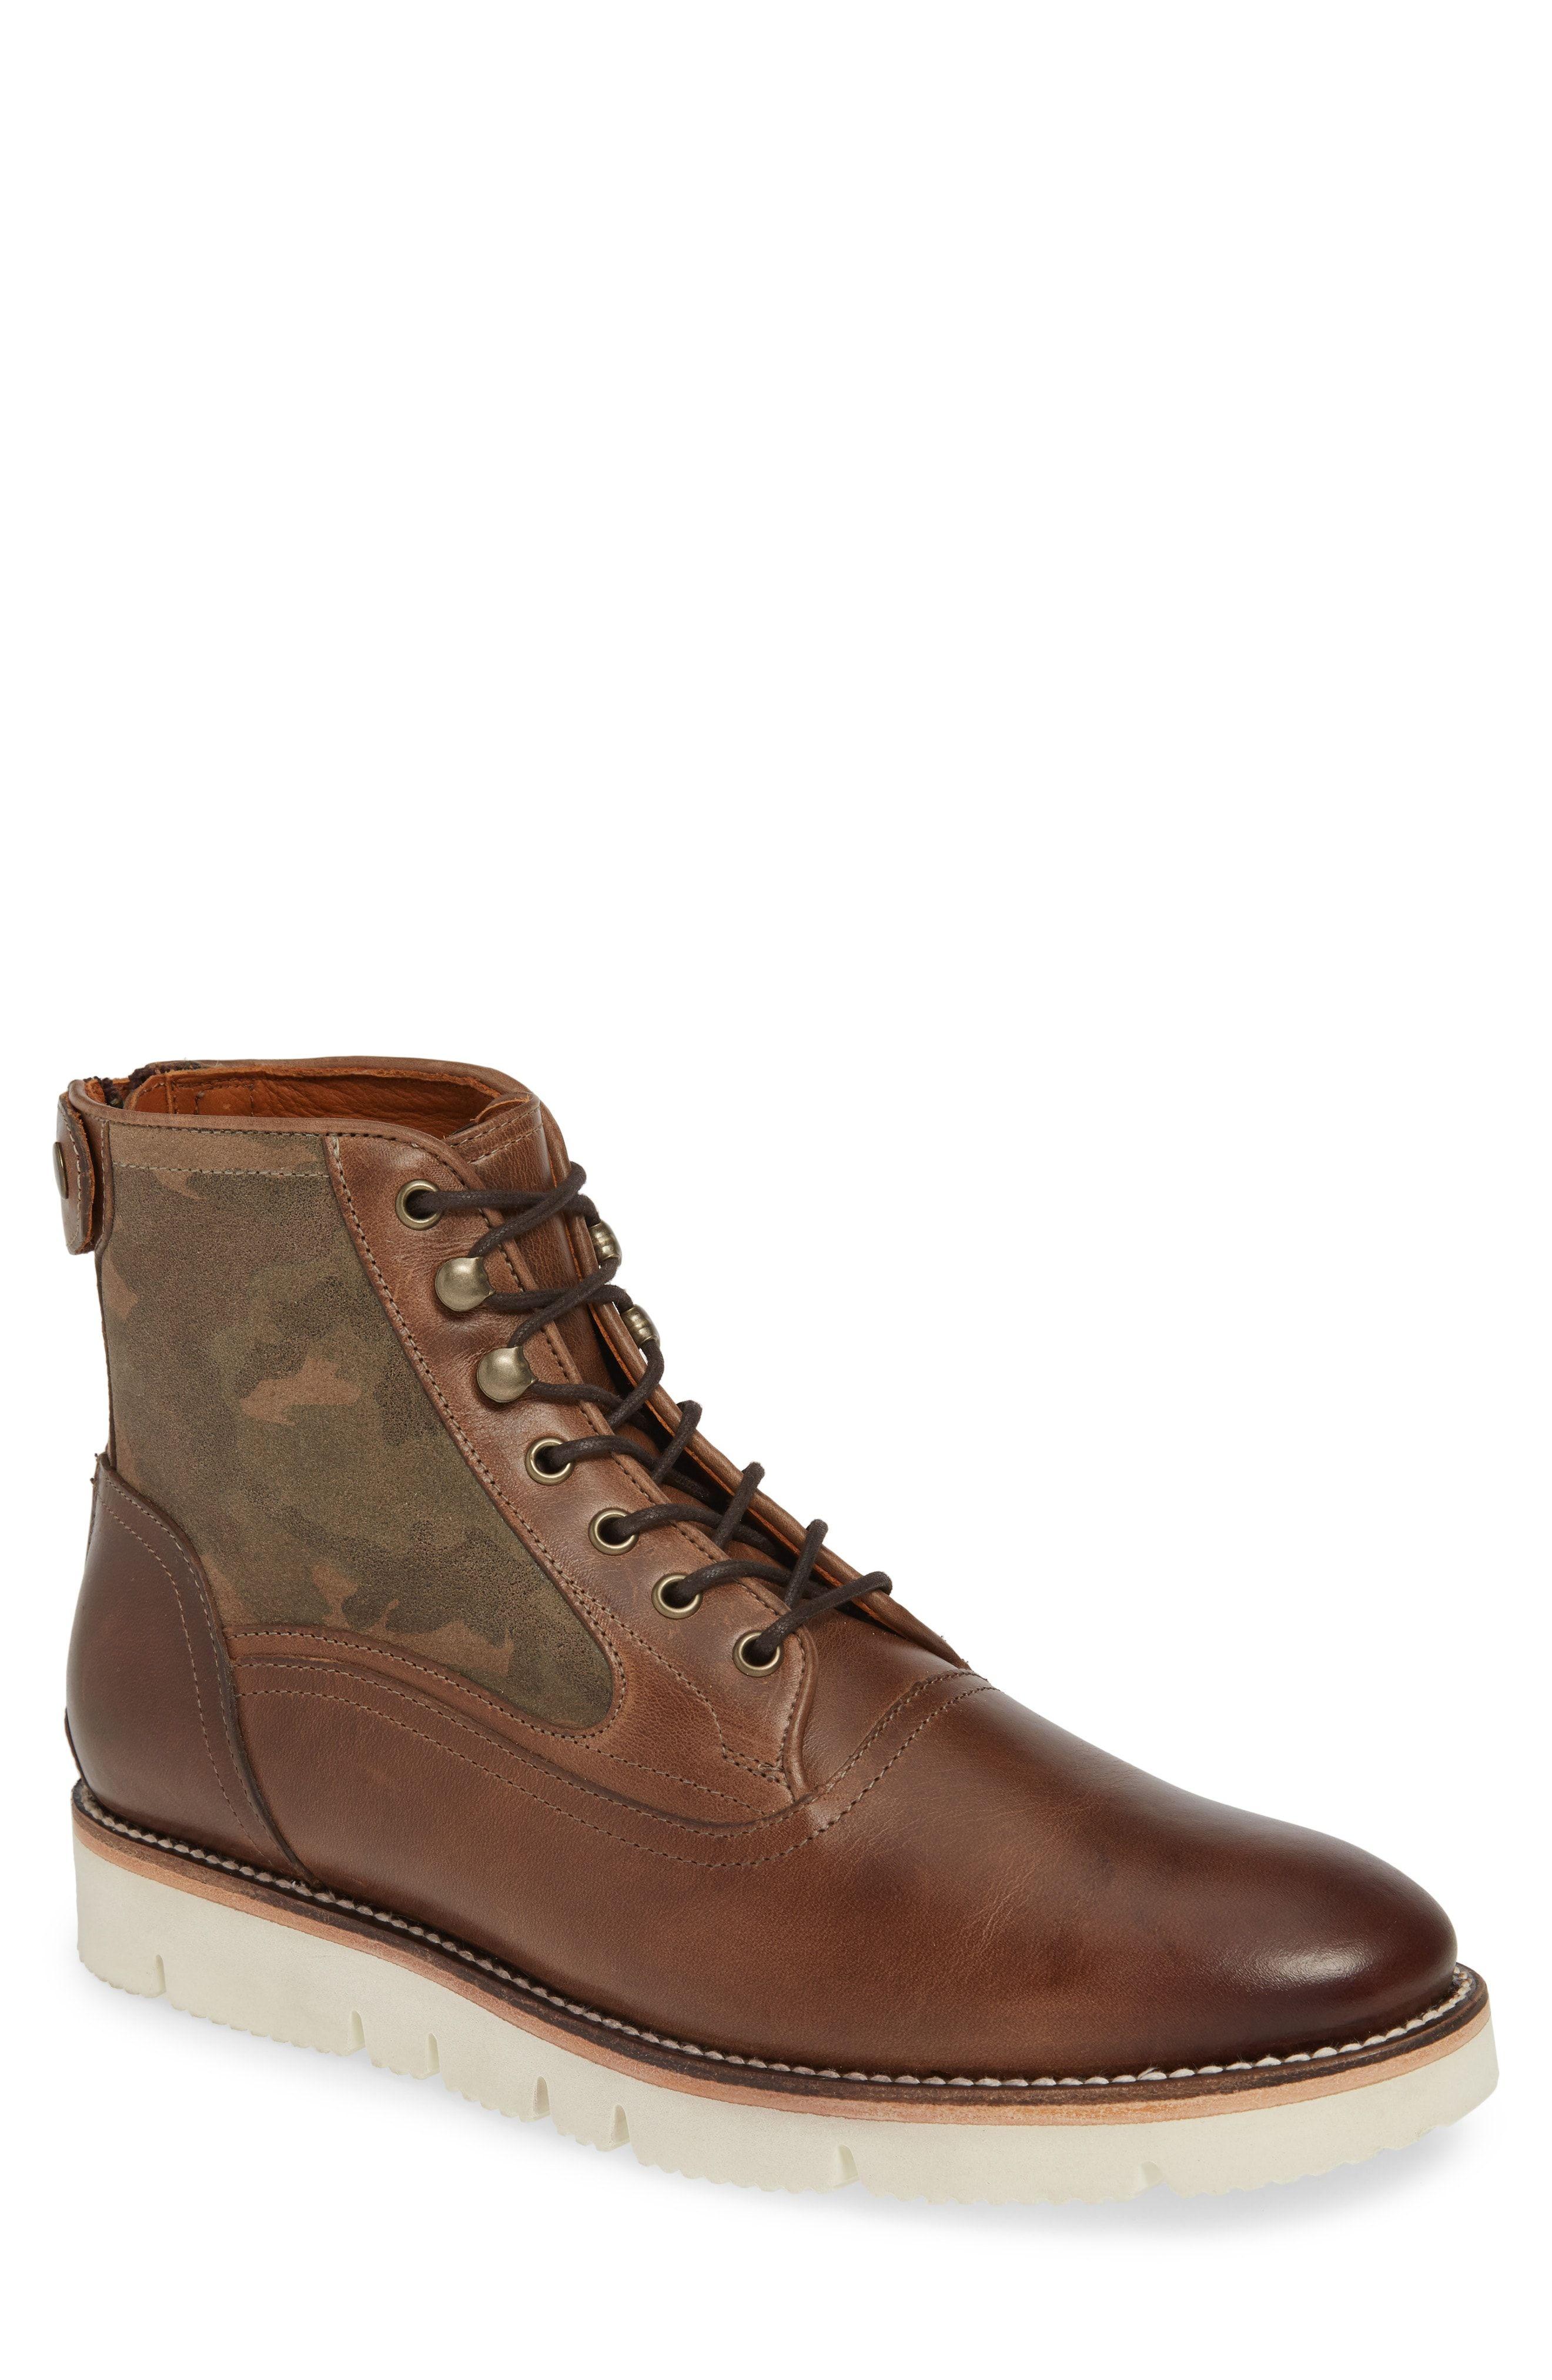 822b578967db ARIAT FAIRVIEW PLAIN TOE BOOT.  ariat  shoes